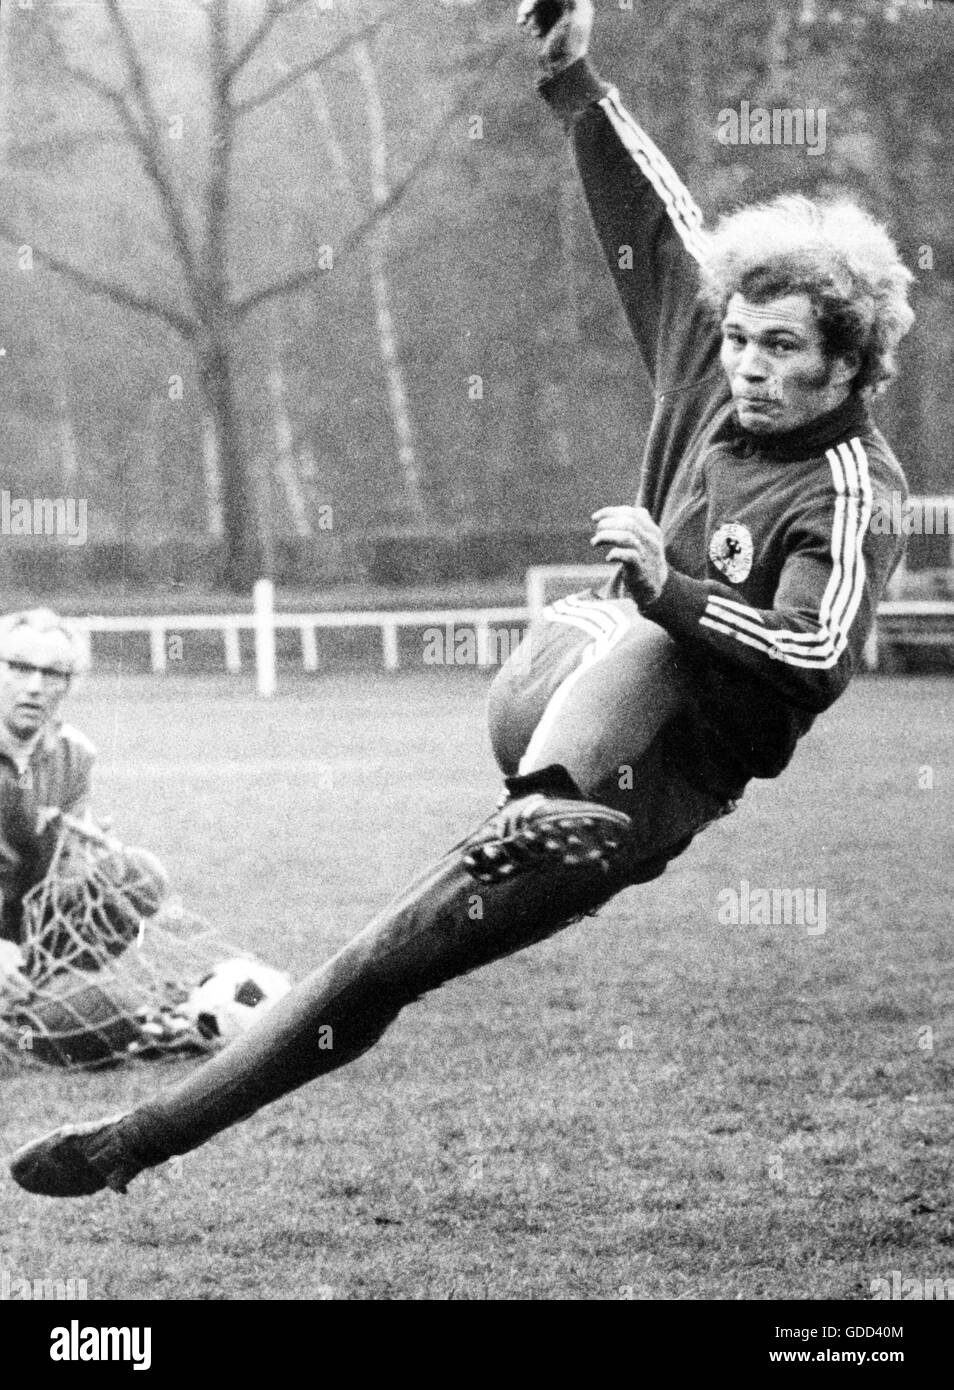 Hoeness Ulrich Uli 5 1 1952 Deutscher Sportler Fussball